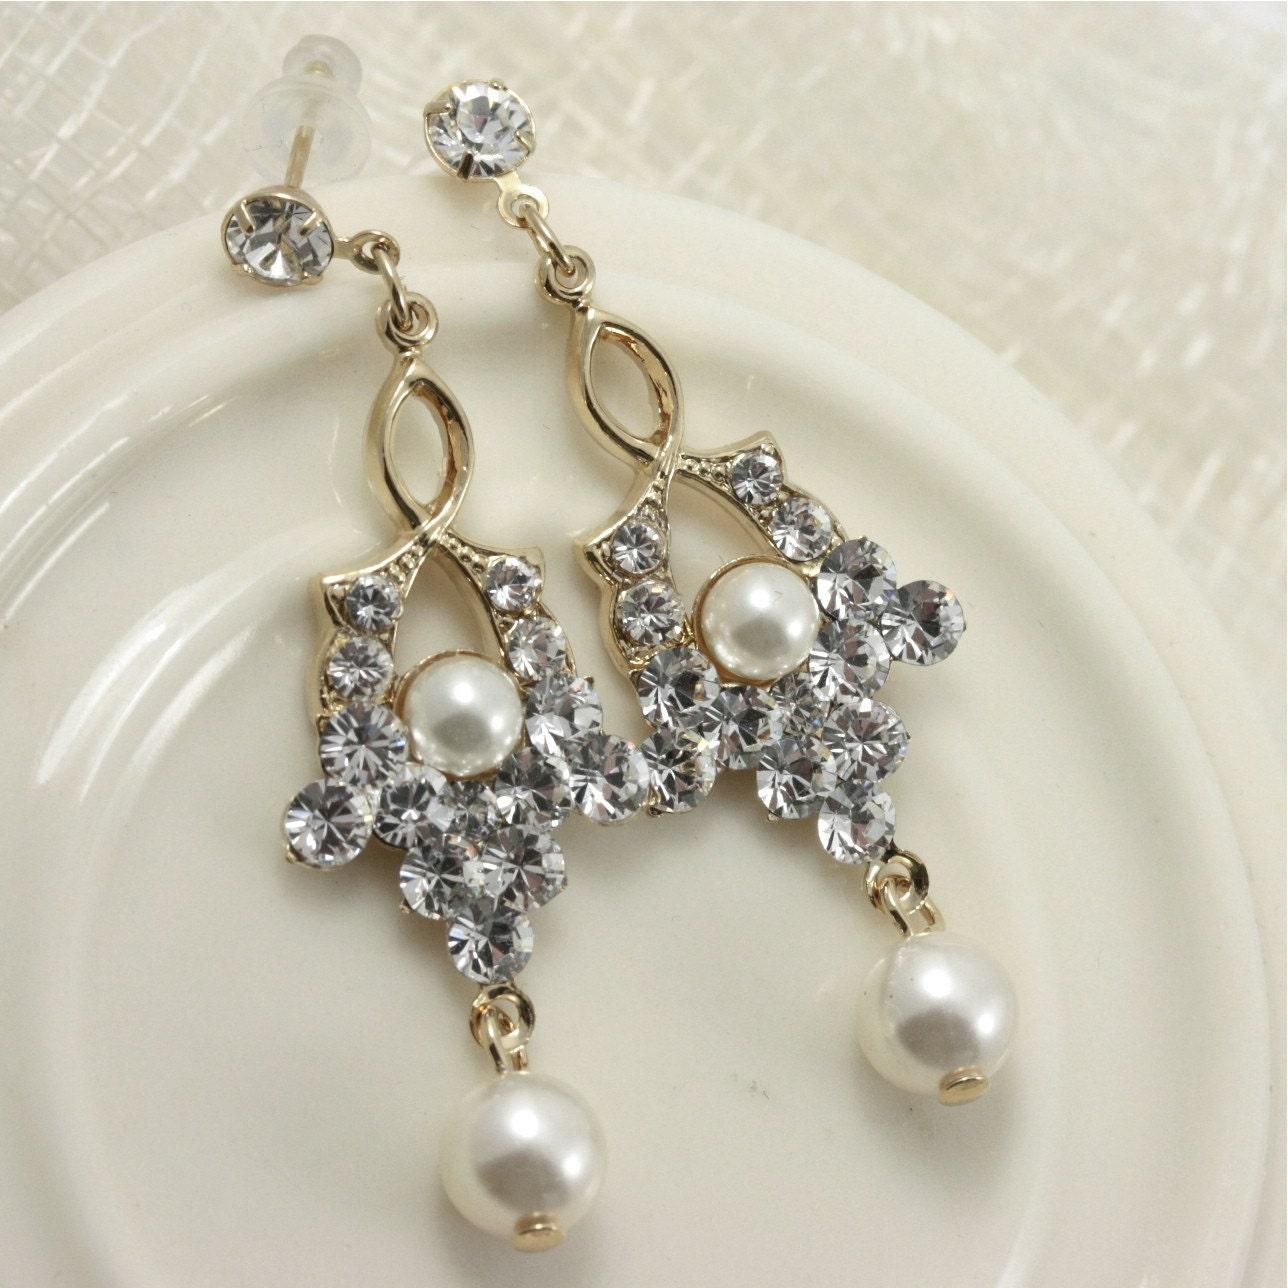 Gold Wedding Earrings , Swarovski Ivory Pearl Dangle Earrings , Gold Wedding Jewelry, Small Rhinestone Earrings,  SEPTEMBER